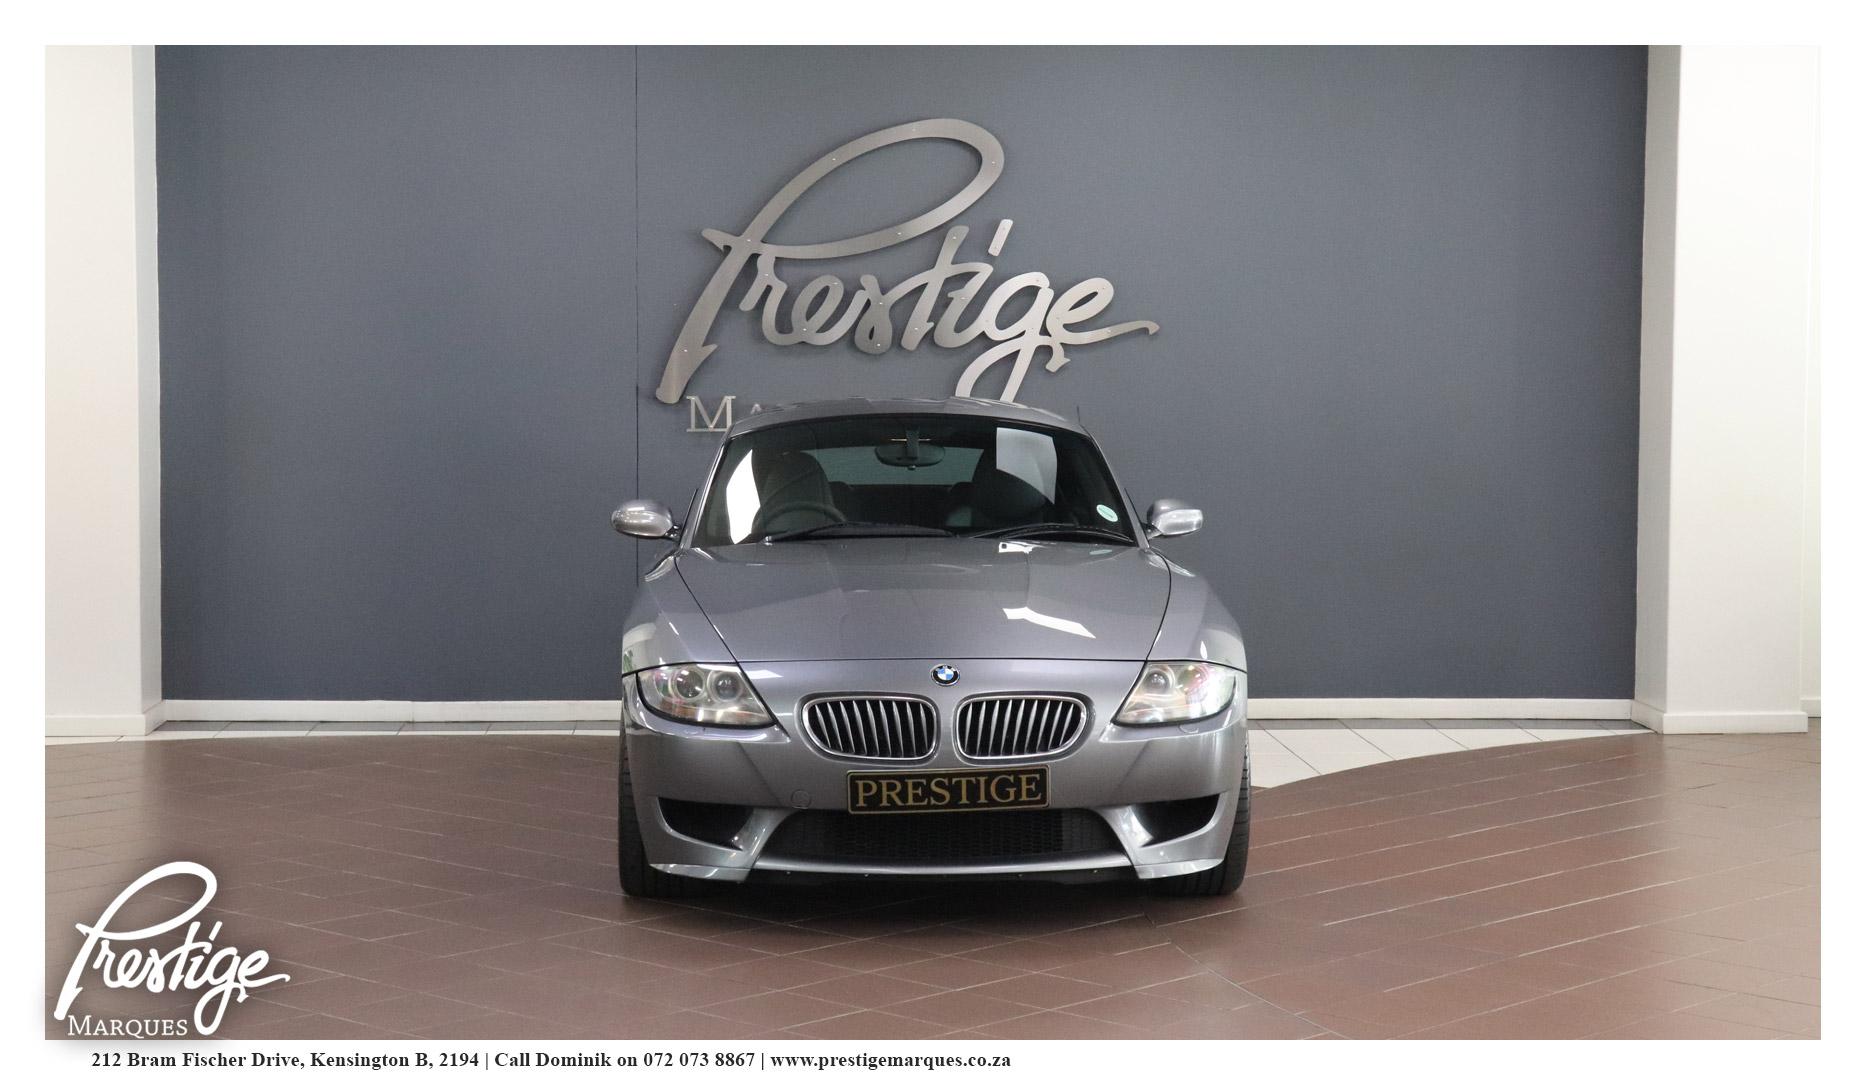 2007-BMW-Z4-M-Coupe-Manual-Prestige-Marques-Randburg-Sandton-9